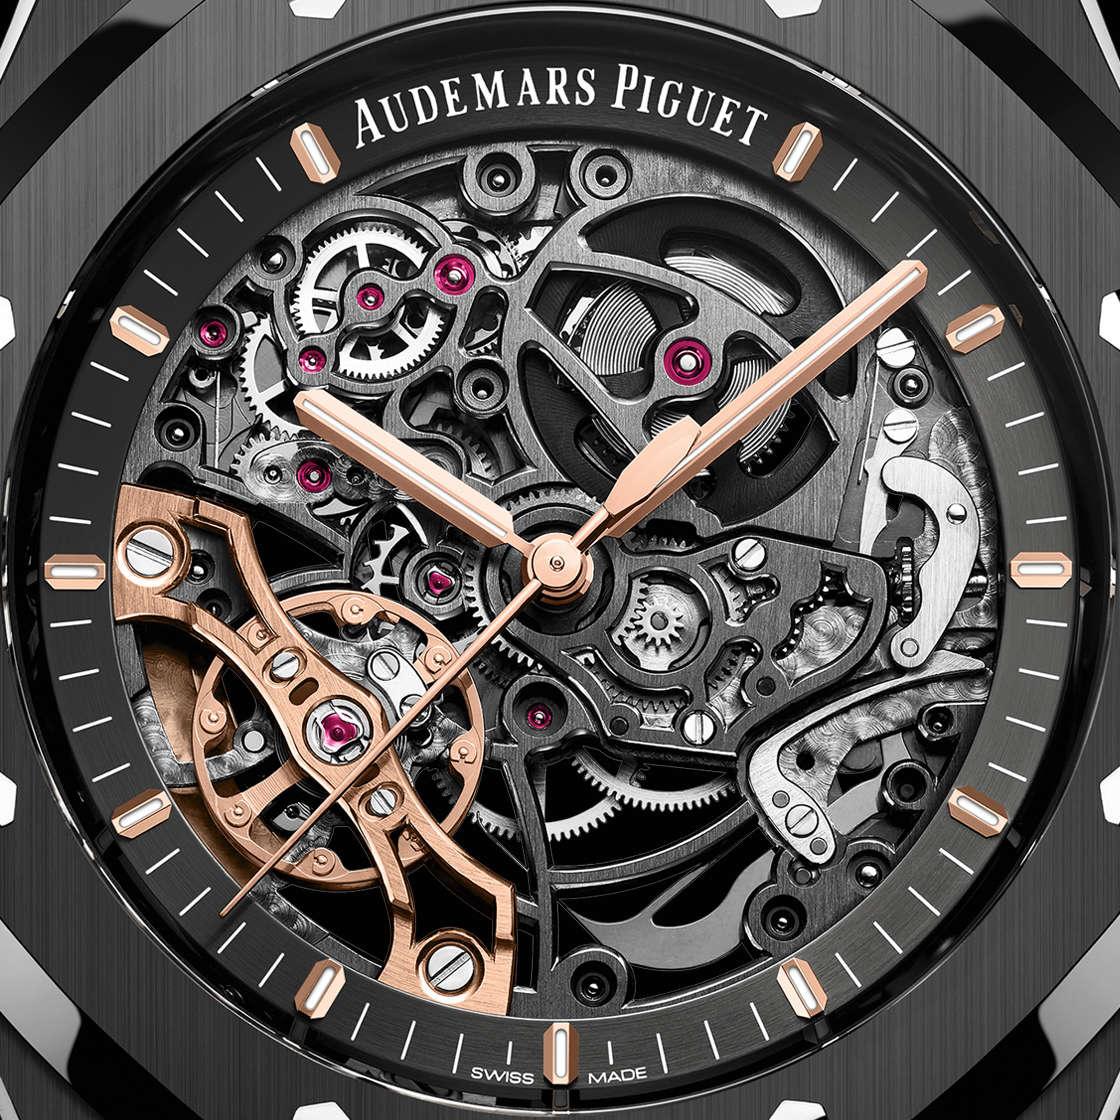 Audemars Piguet Royal Oak Double Balance Wheel Openworked Black Ceramic